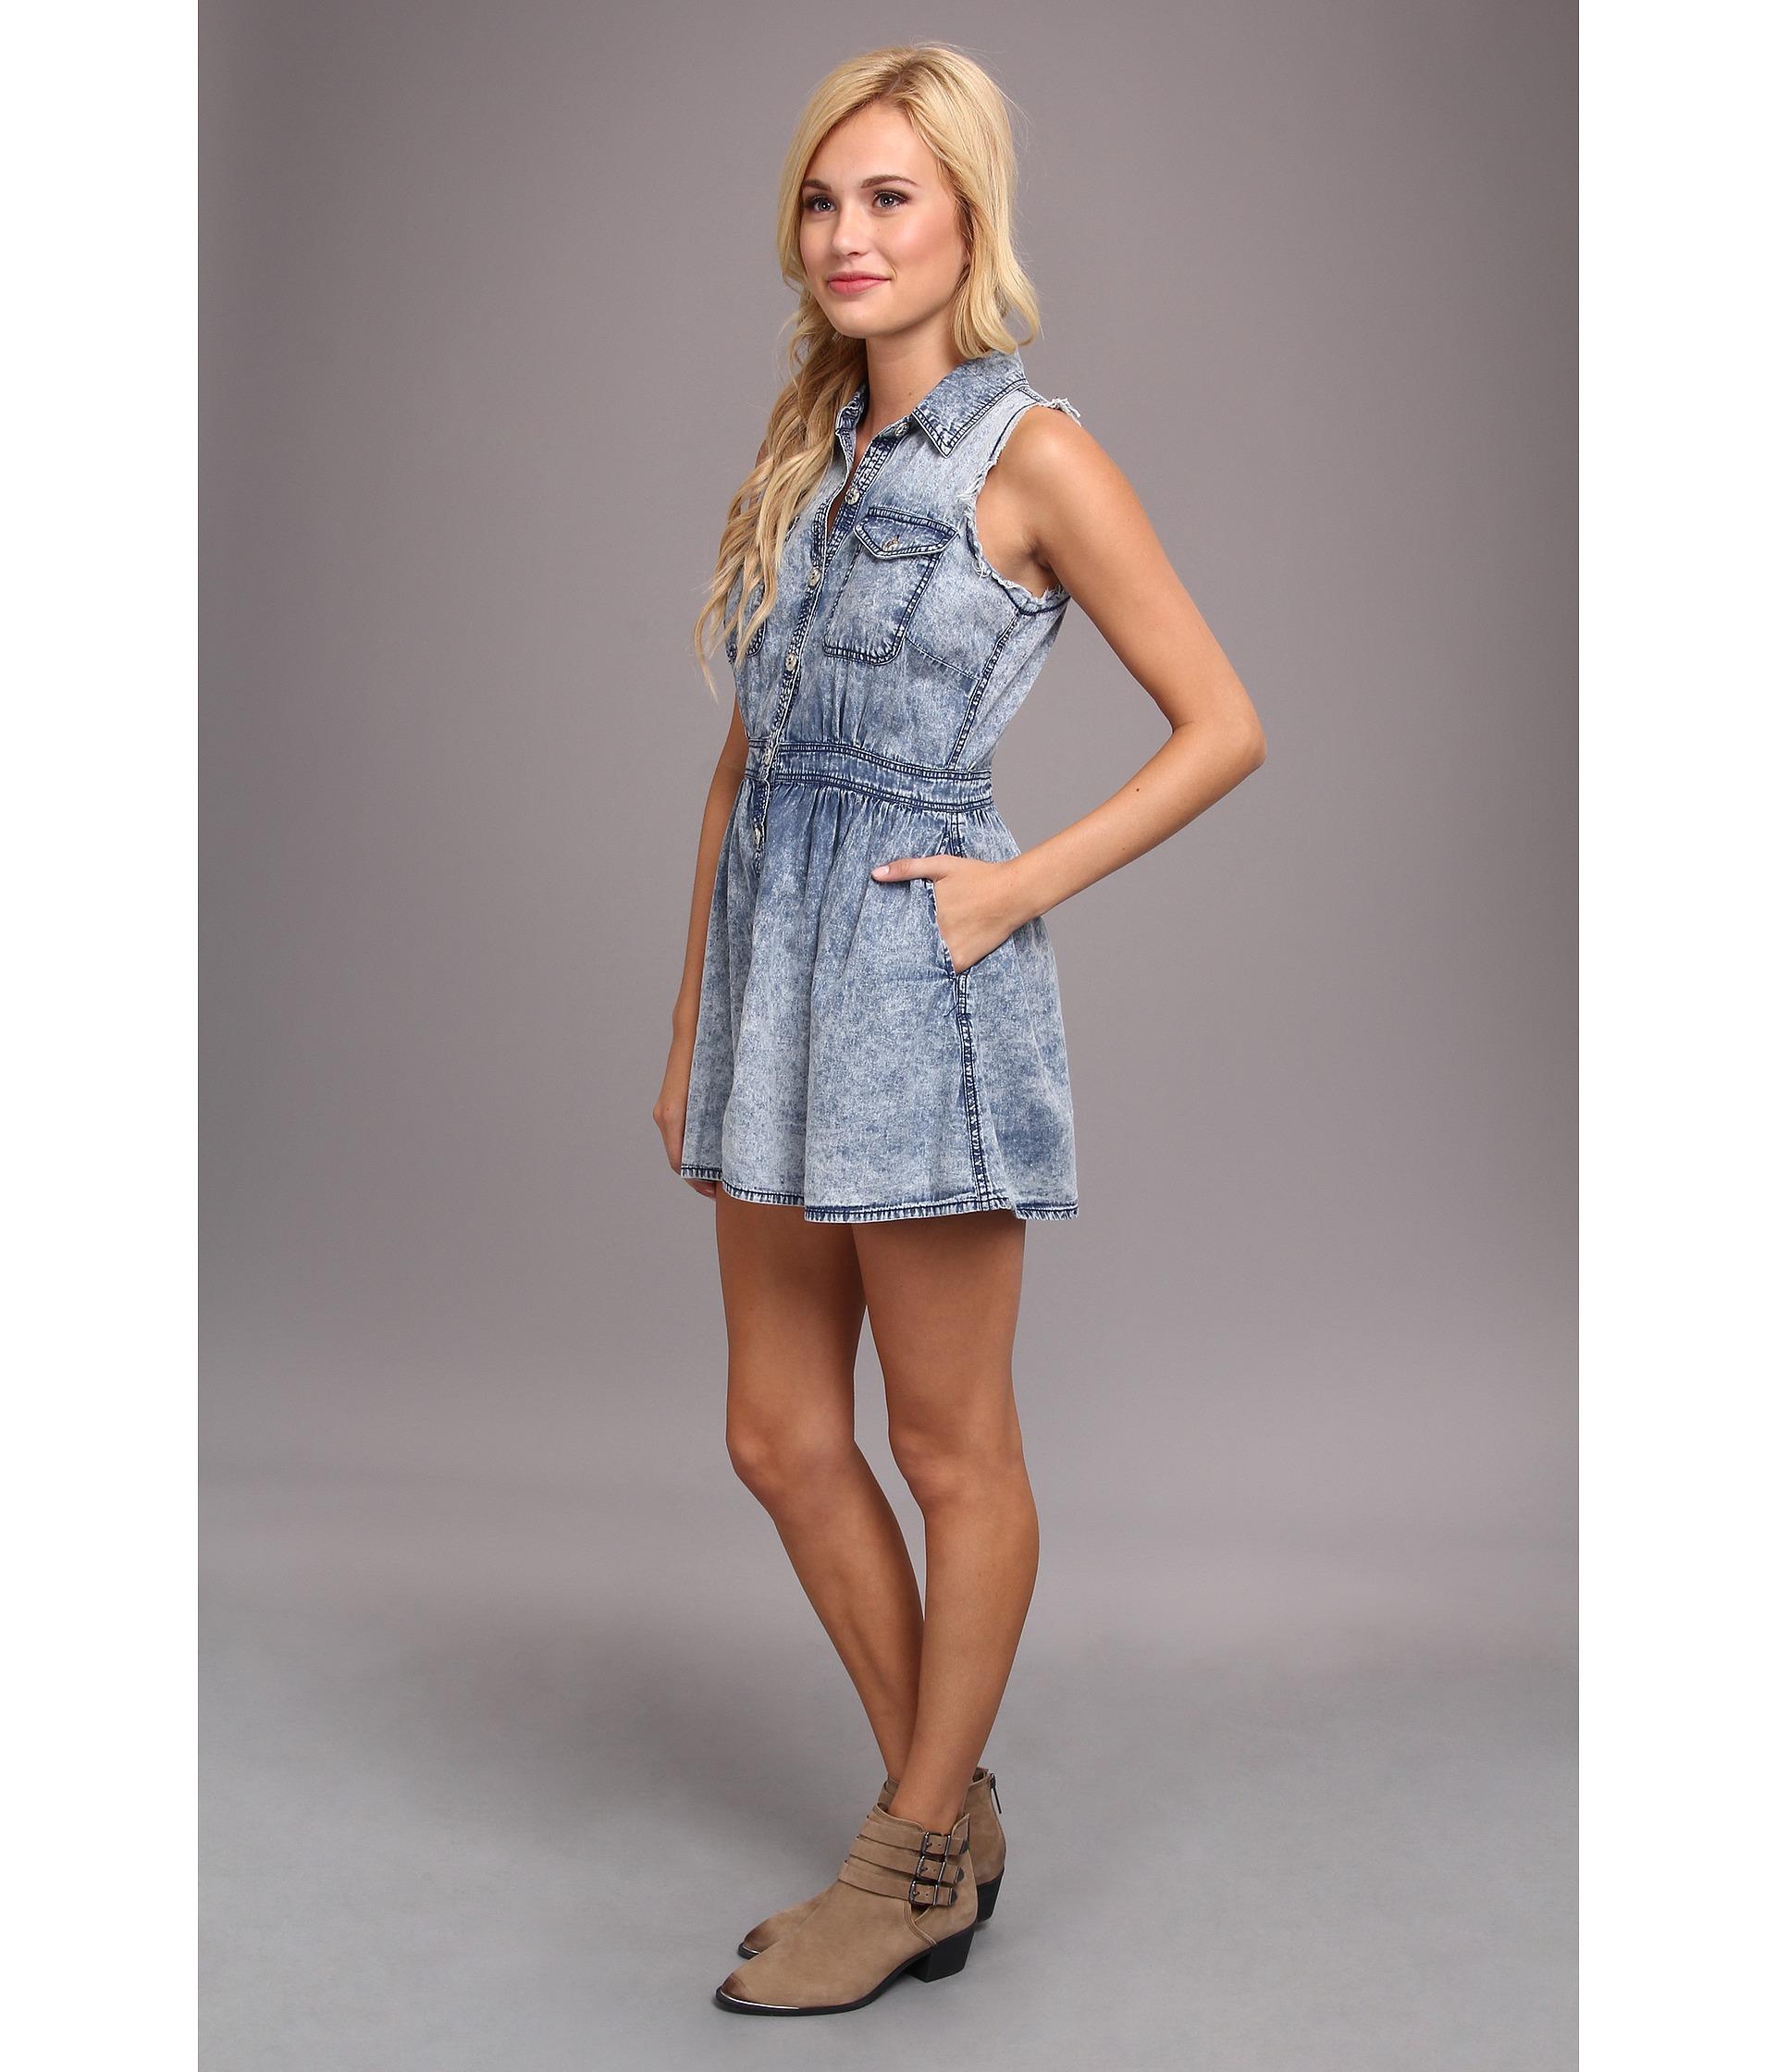 Candydoll Lauren F Silver Stars Models | newhairstylesformen2014.com